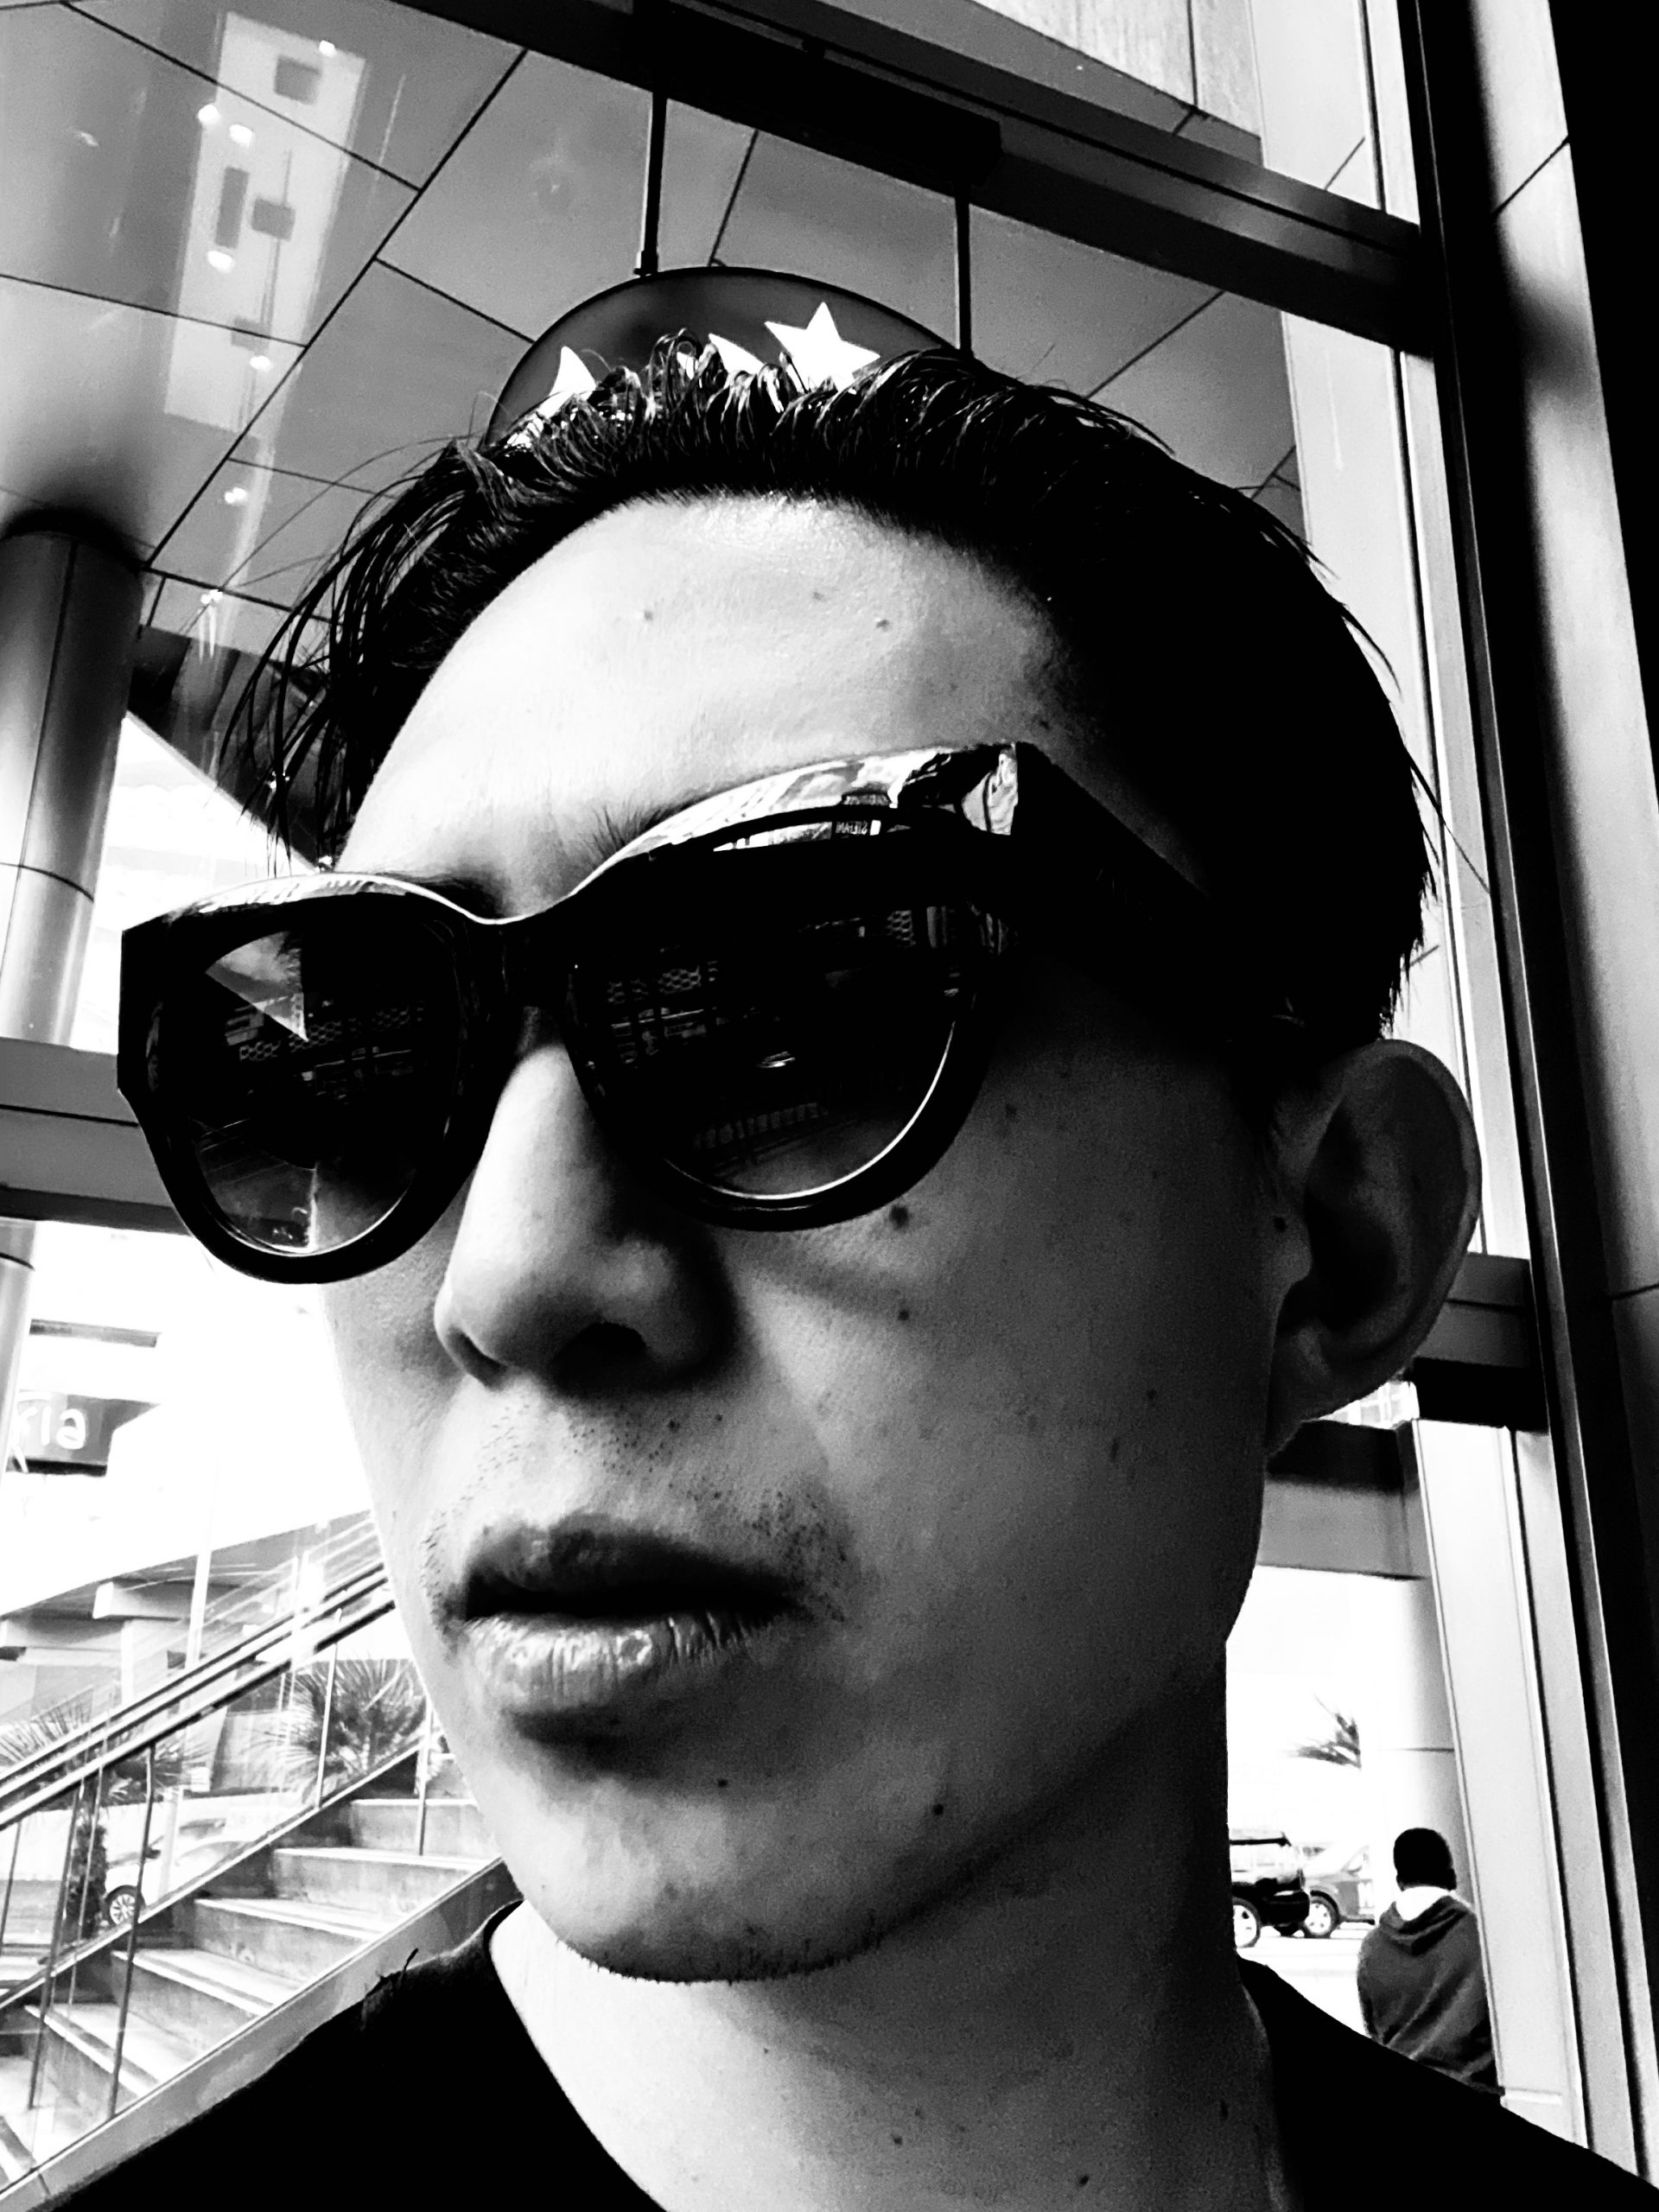 Selfie sunglasses